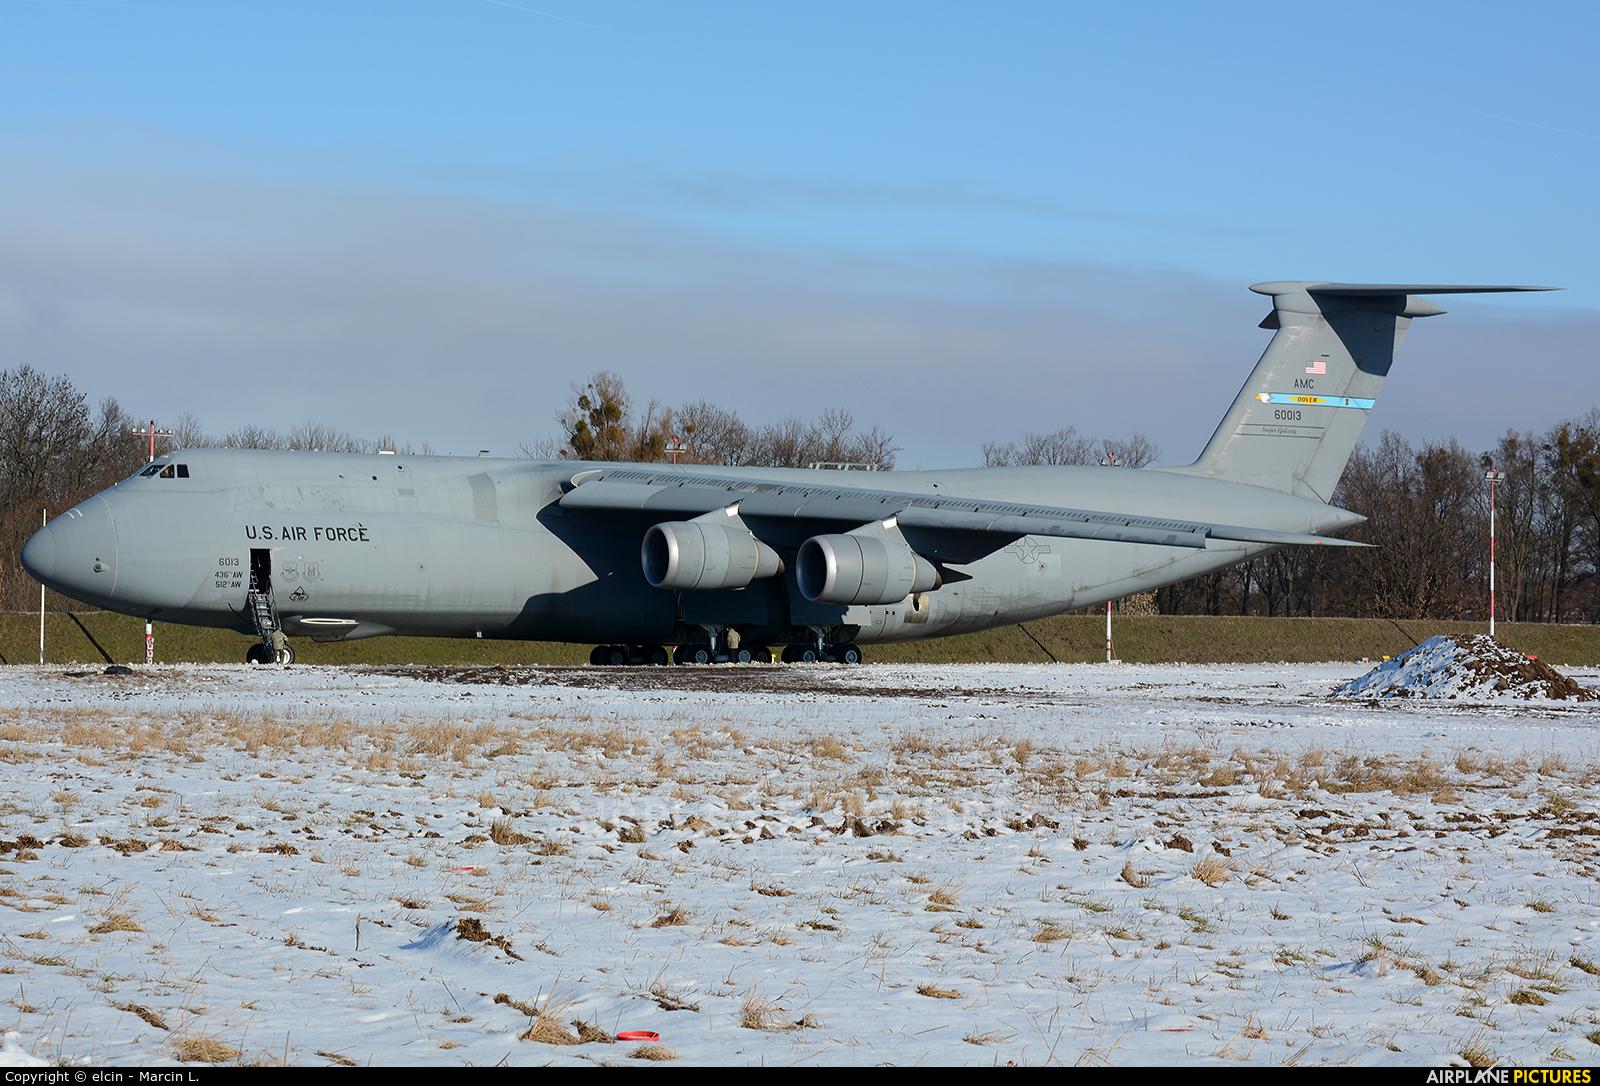 USA - Air Force 86-0013 aircraft at Wrocław - Copernicus